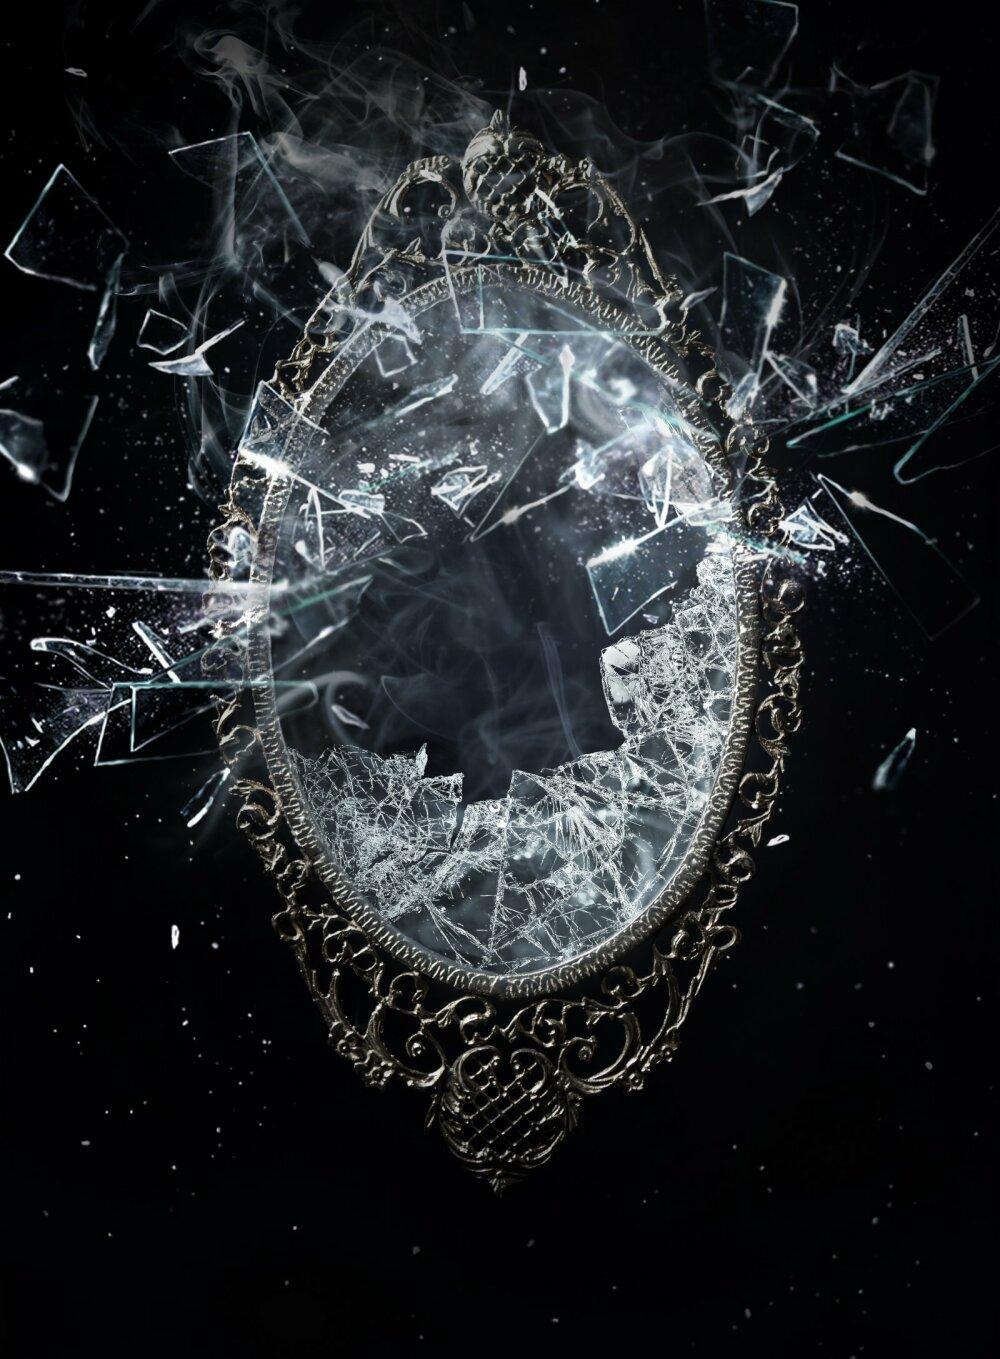 разбитое зеркало приметы